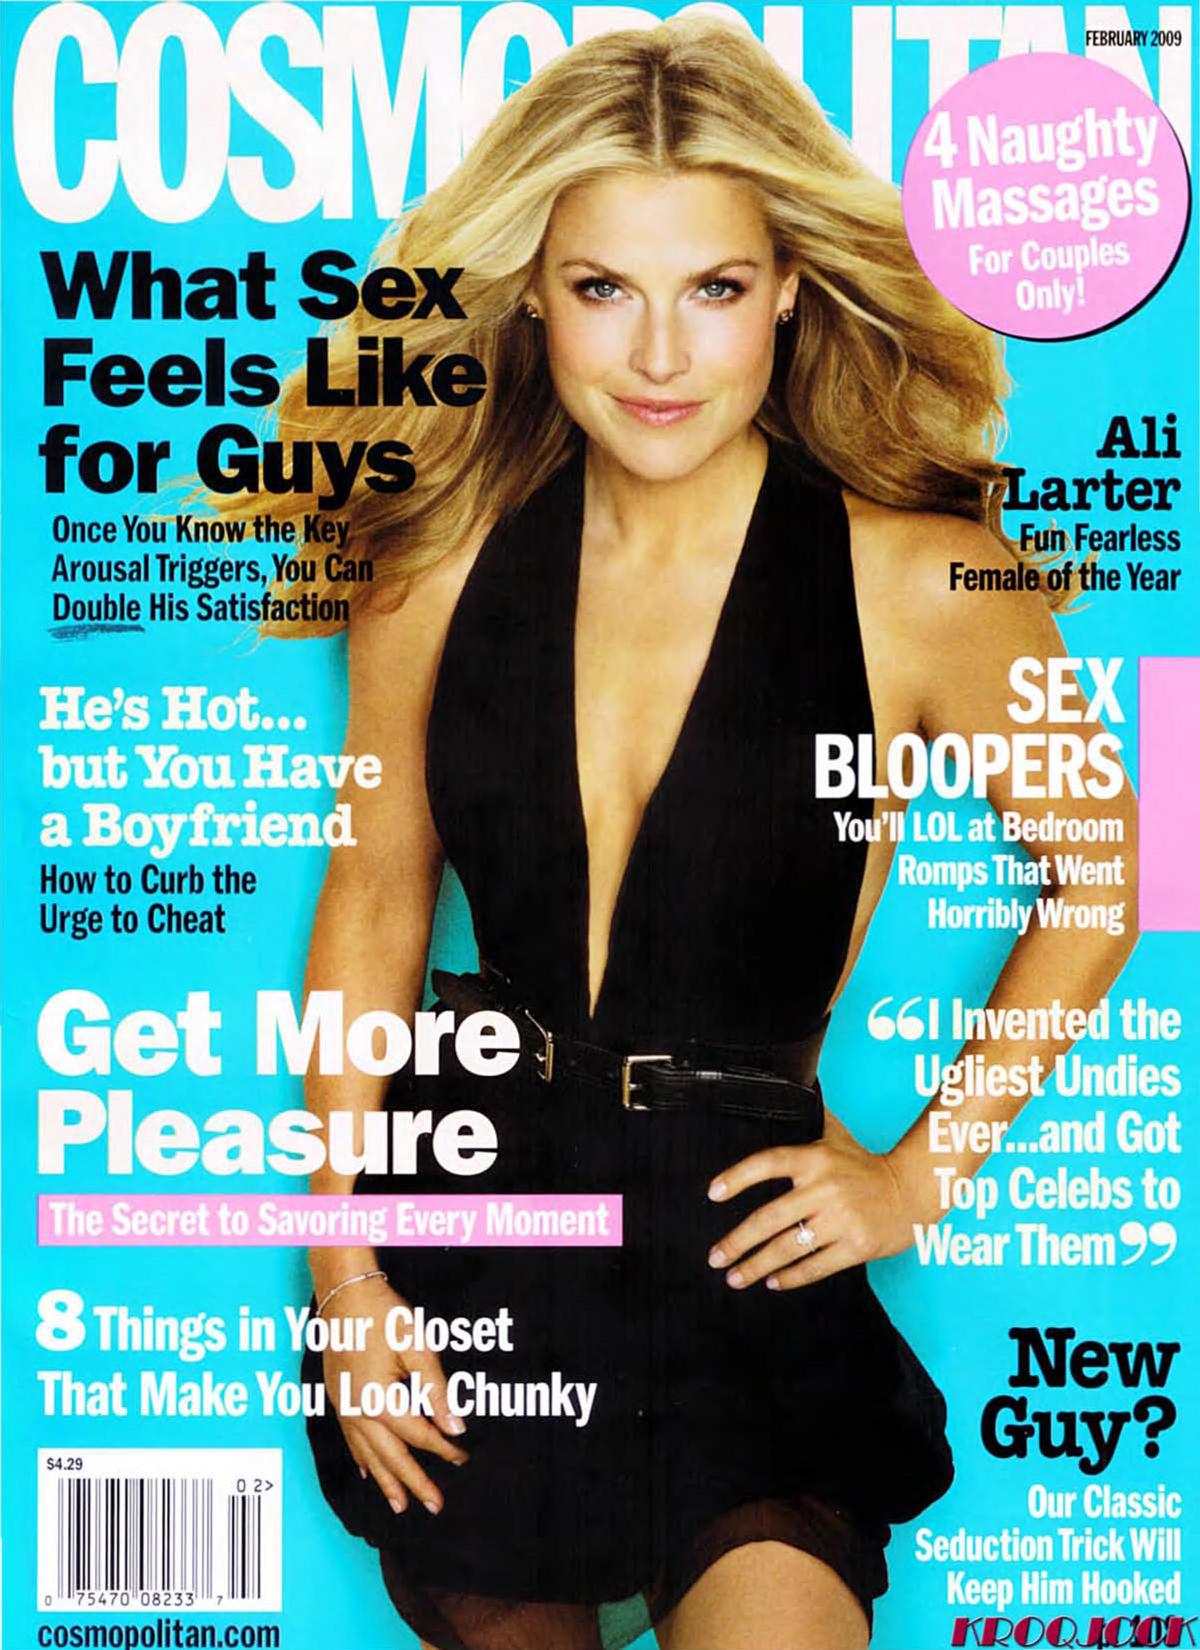 cosmopolitan_feb2009-1.jpg